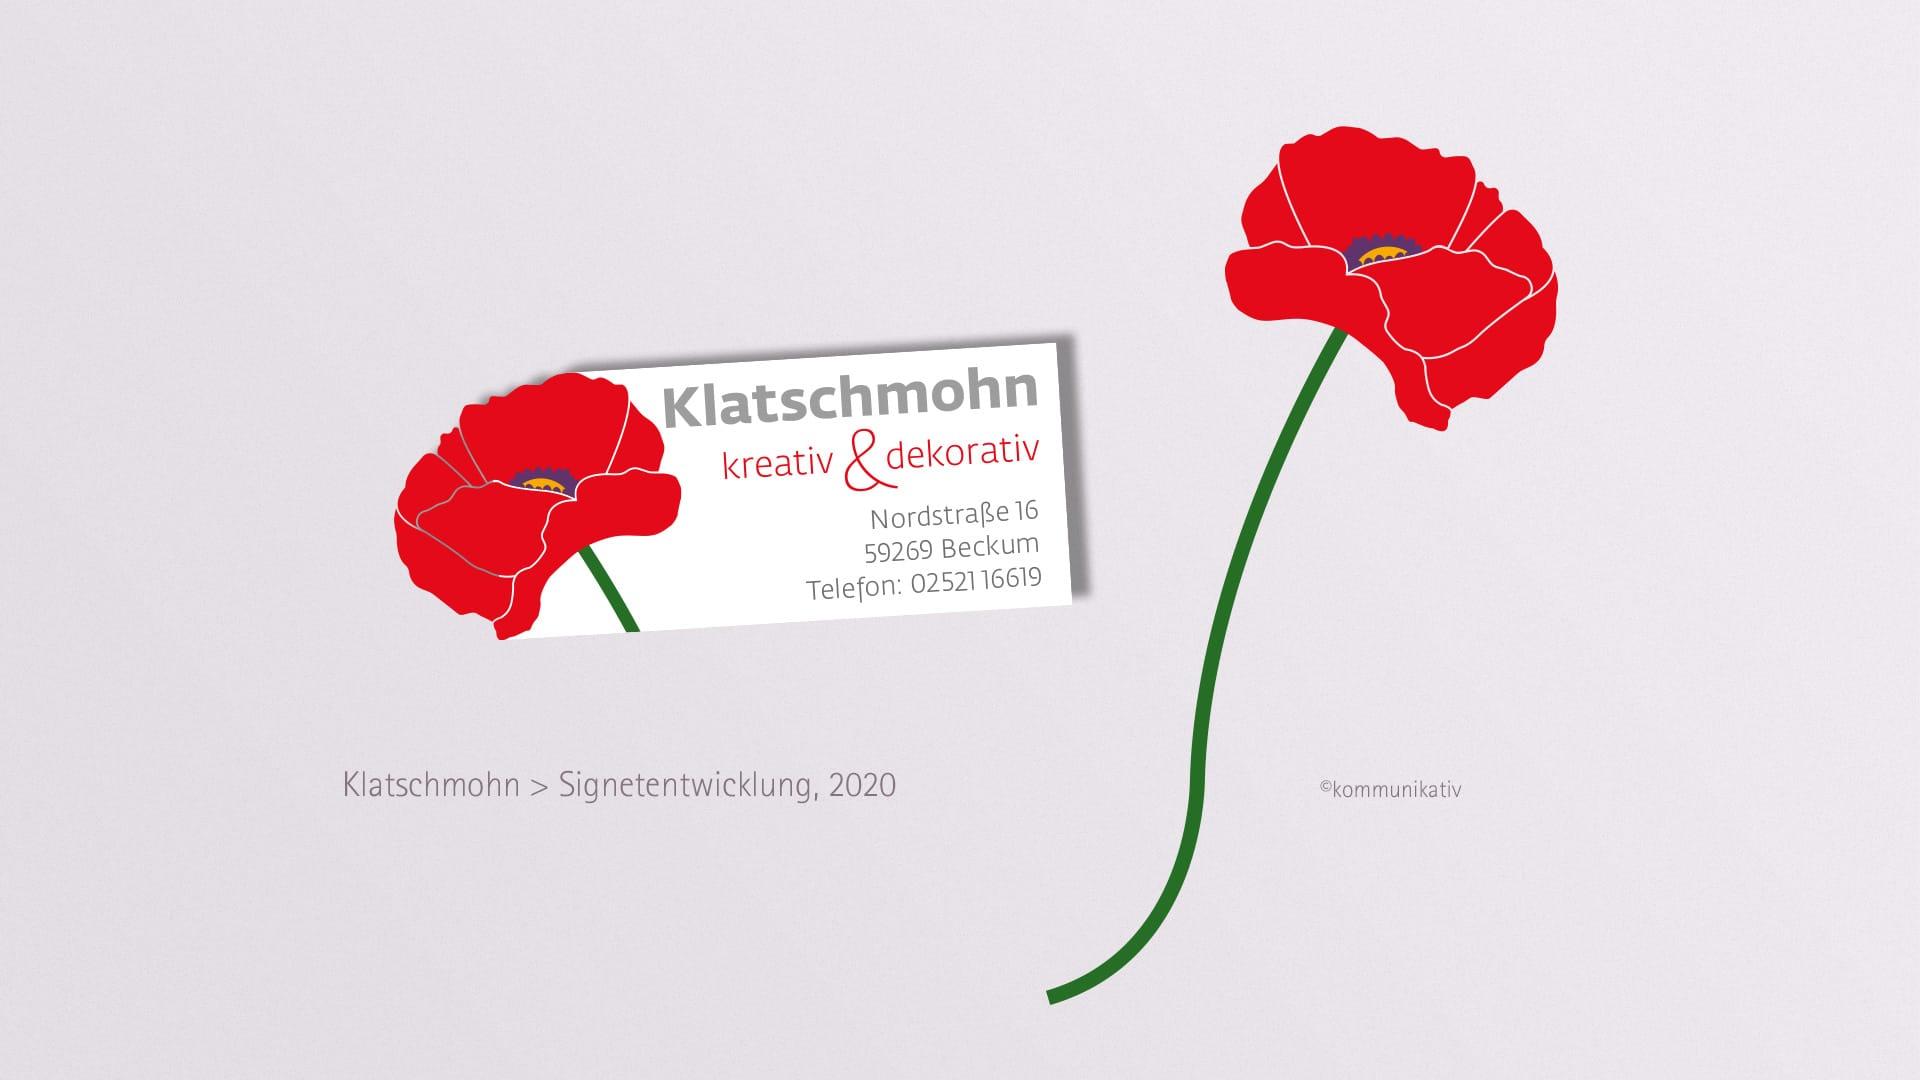 Logo-Redesign Klatschmohn Beckum